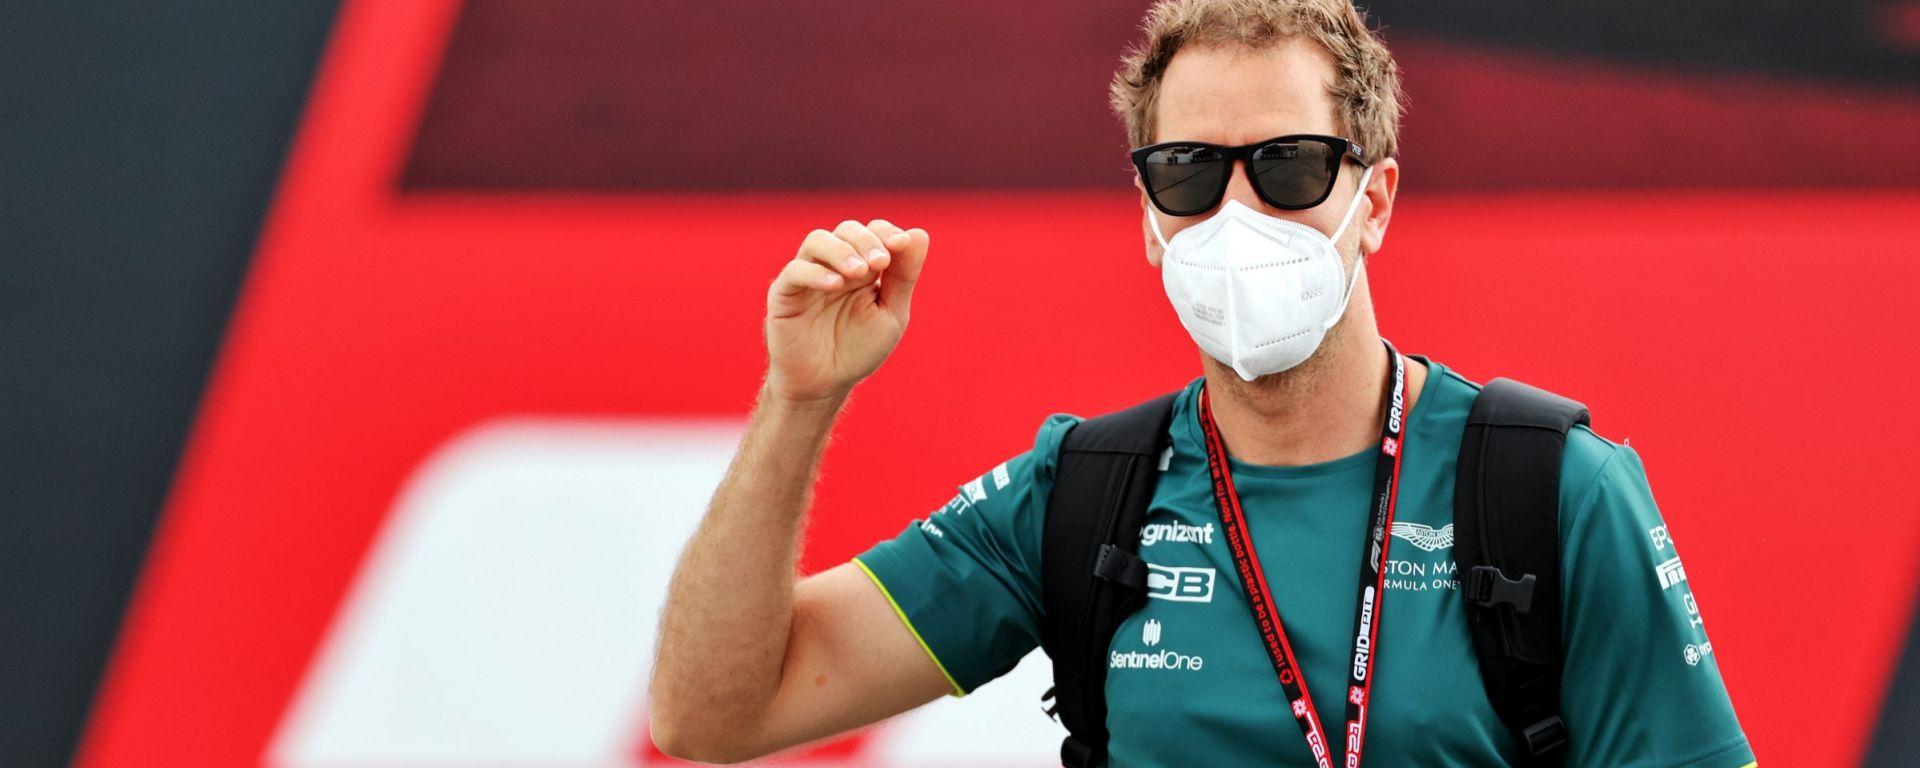 F1, GP Portogallo 2021: Sebastian Vettel (Aston Martin)